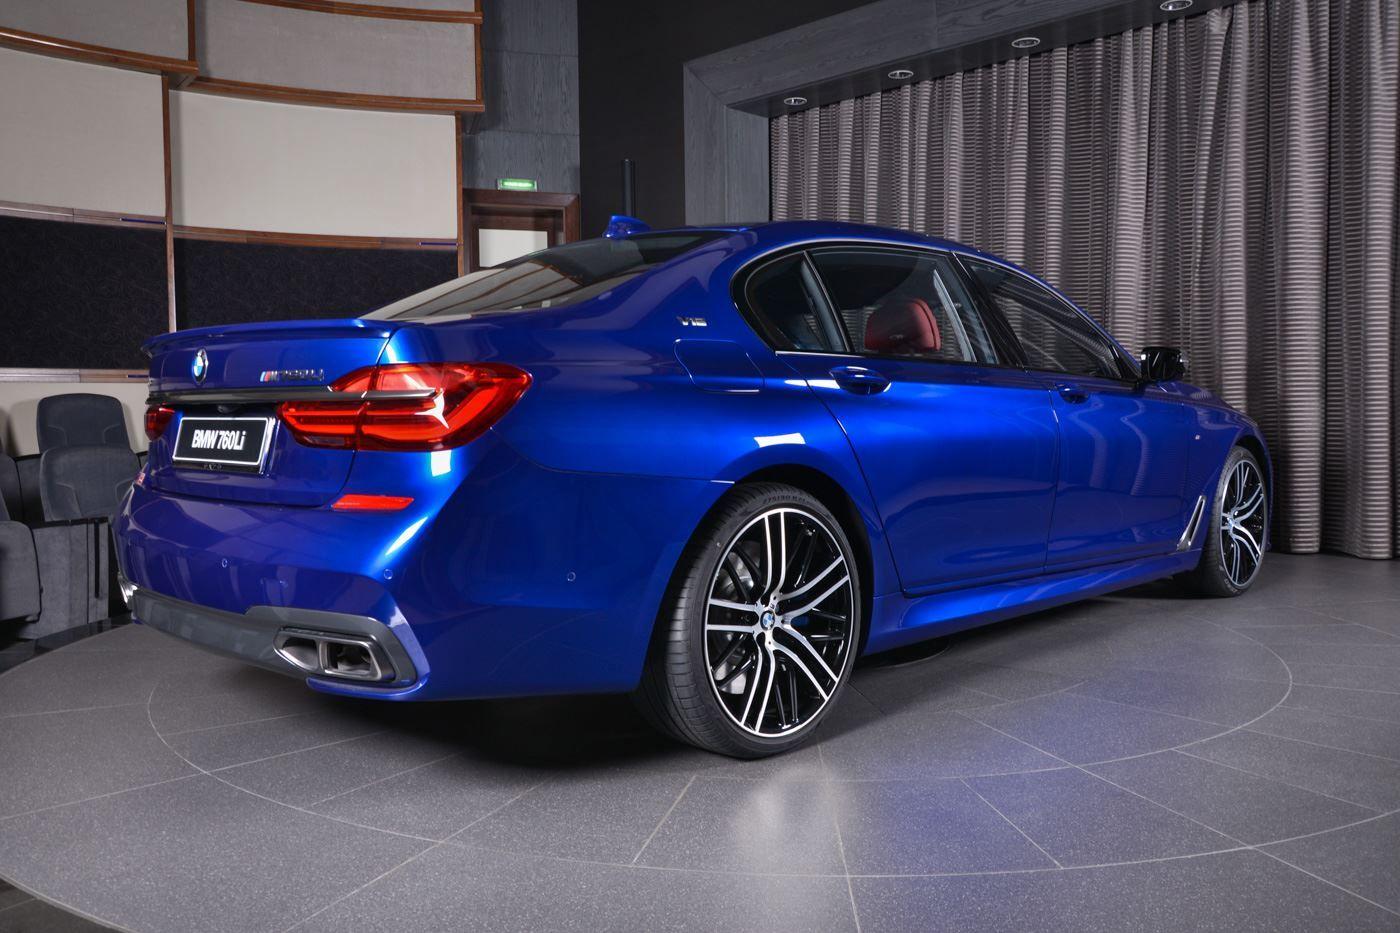 San Marino Blue Bmw M760li Looks Almost Perfect Carscoops Bmw Luxury Suv Bmw 7 Series